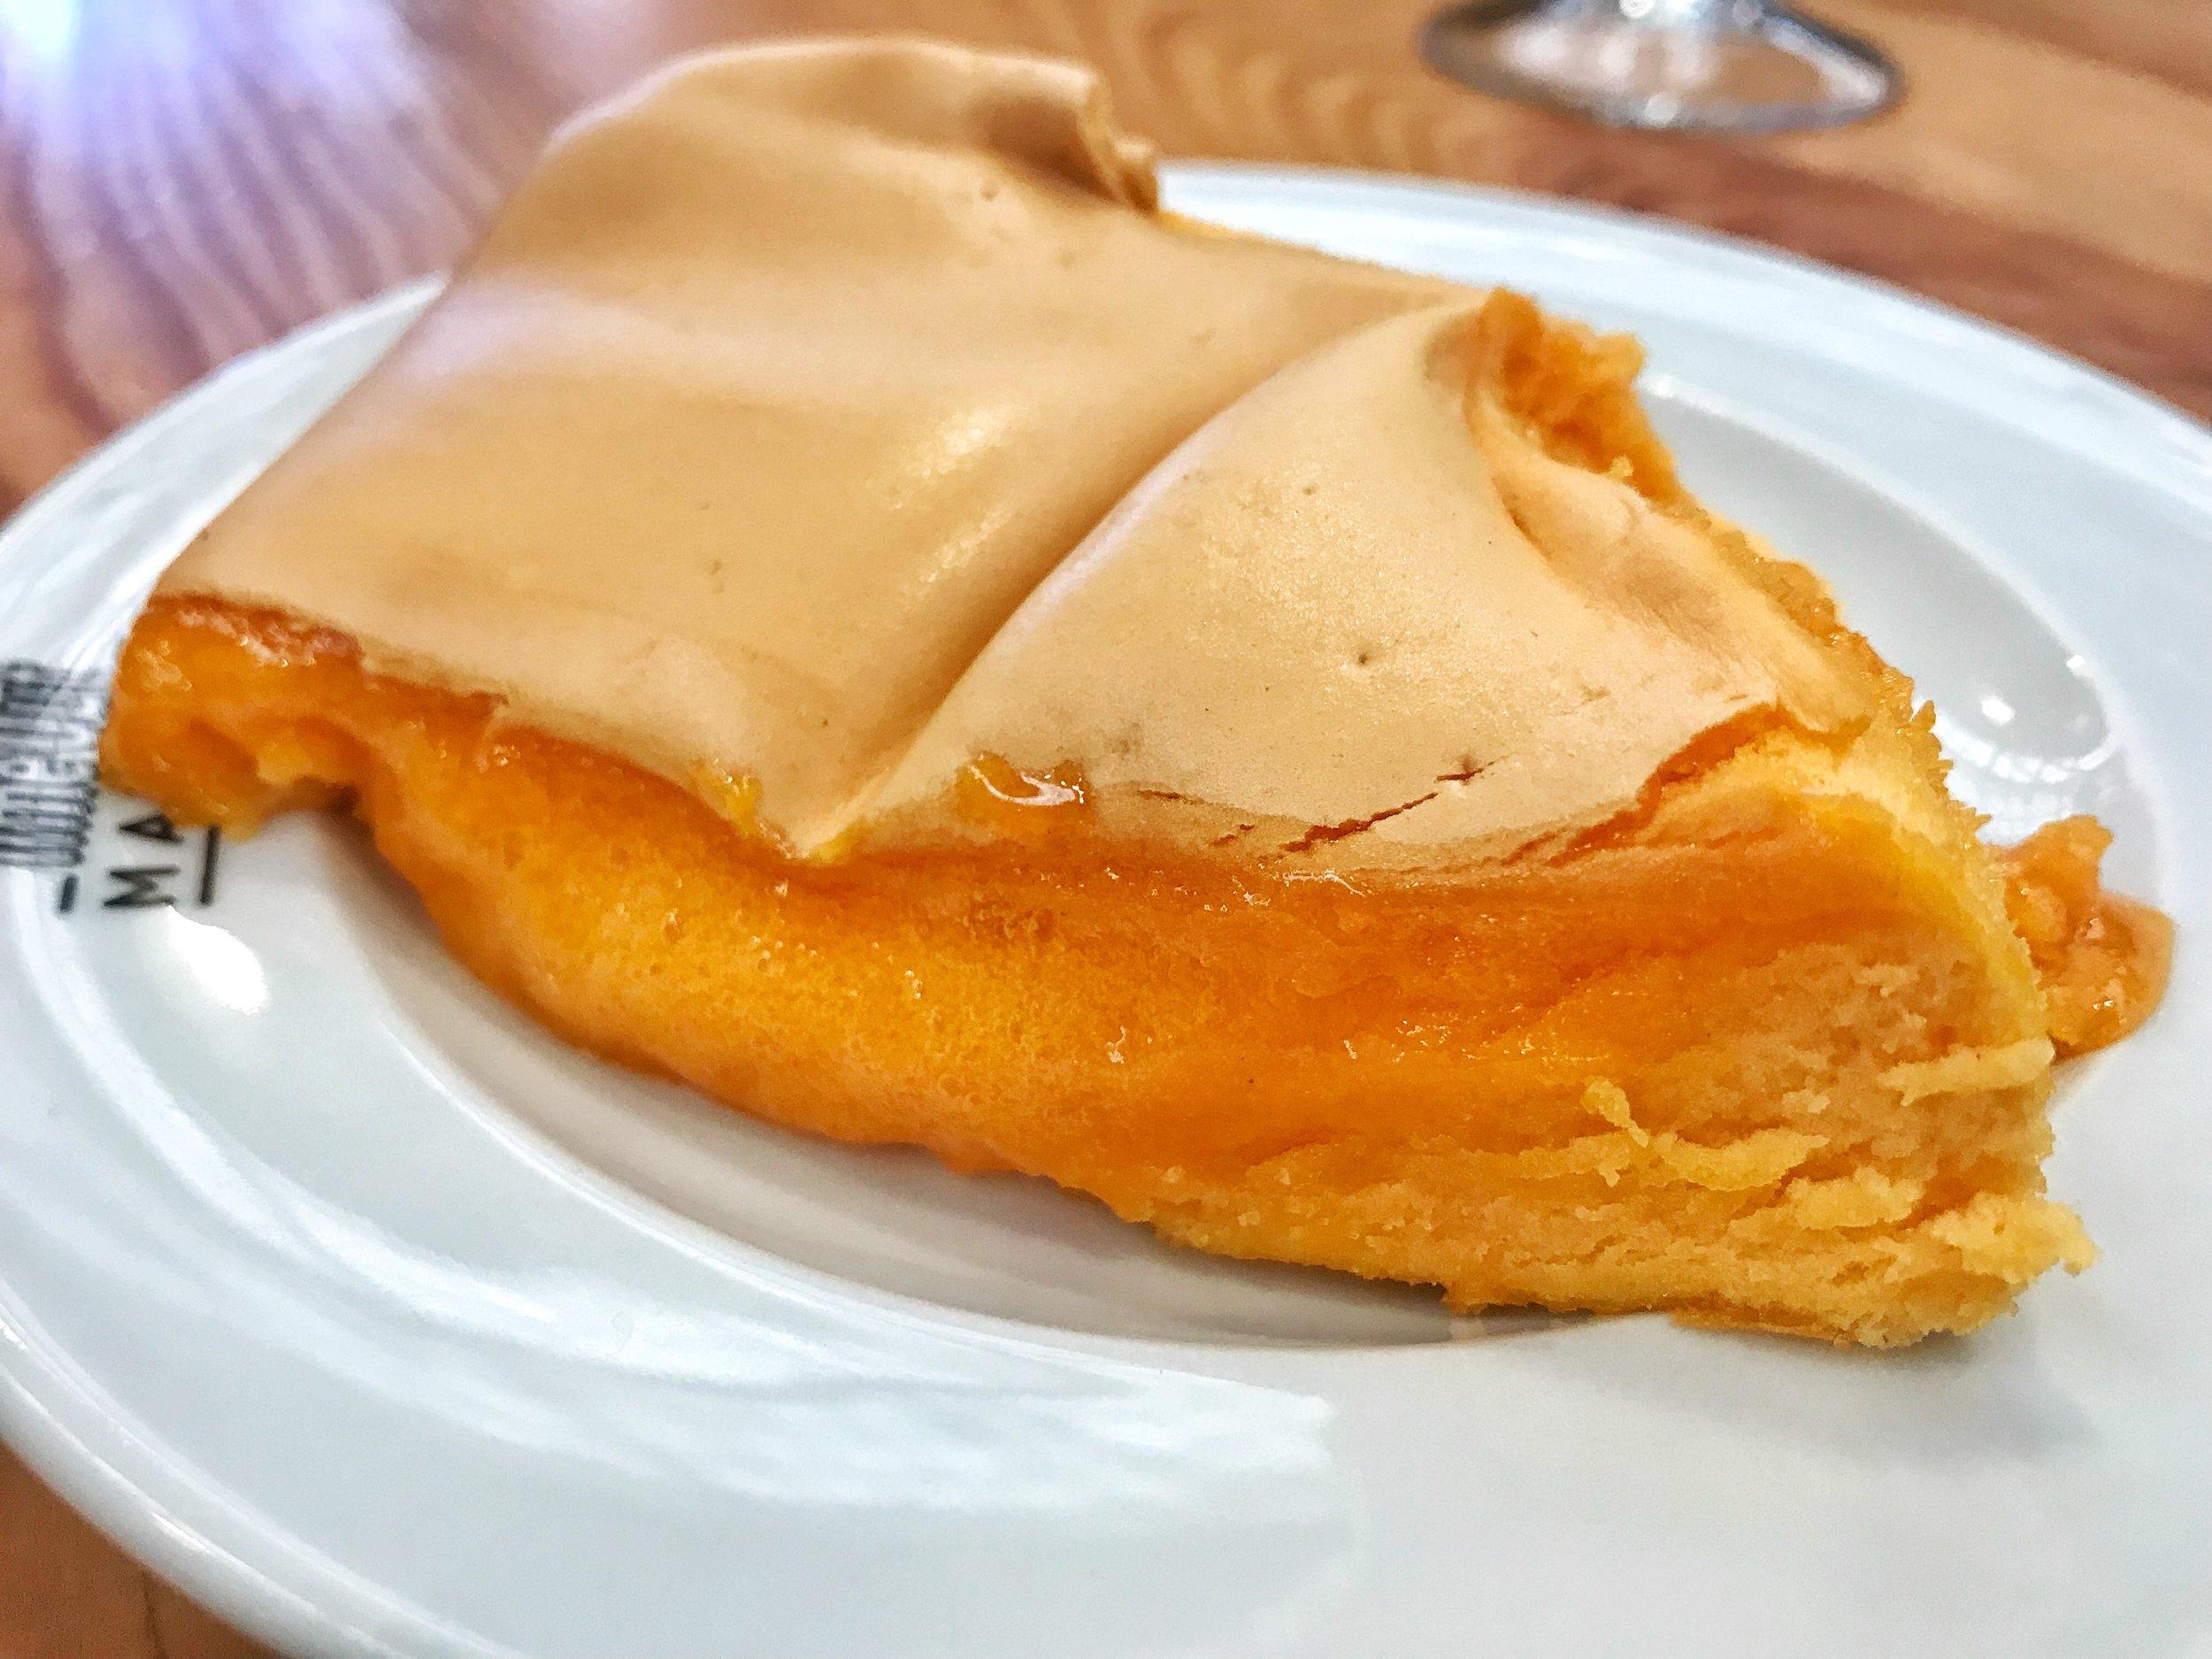 Eggy custard